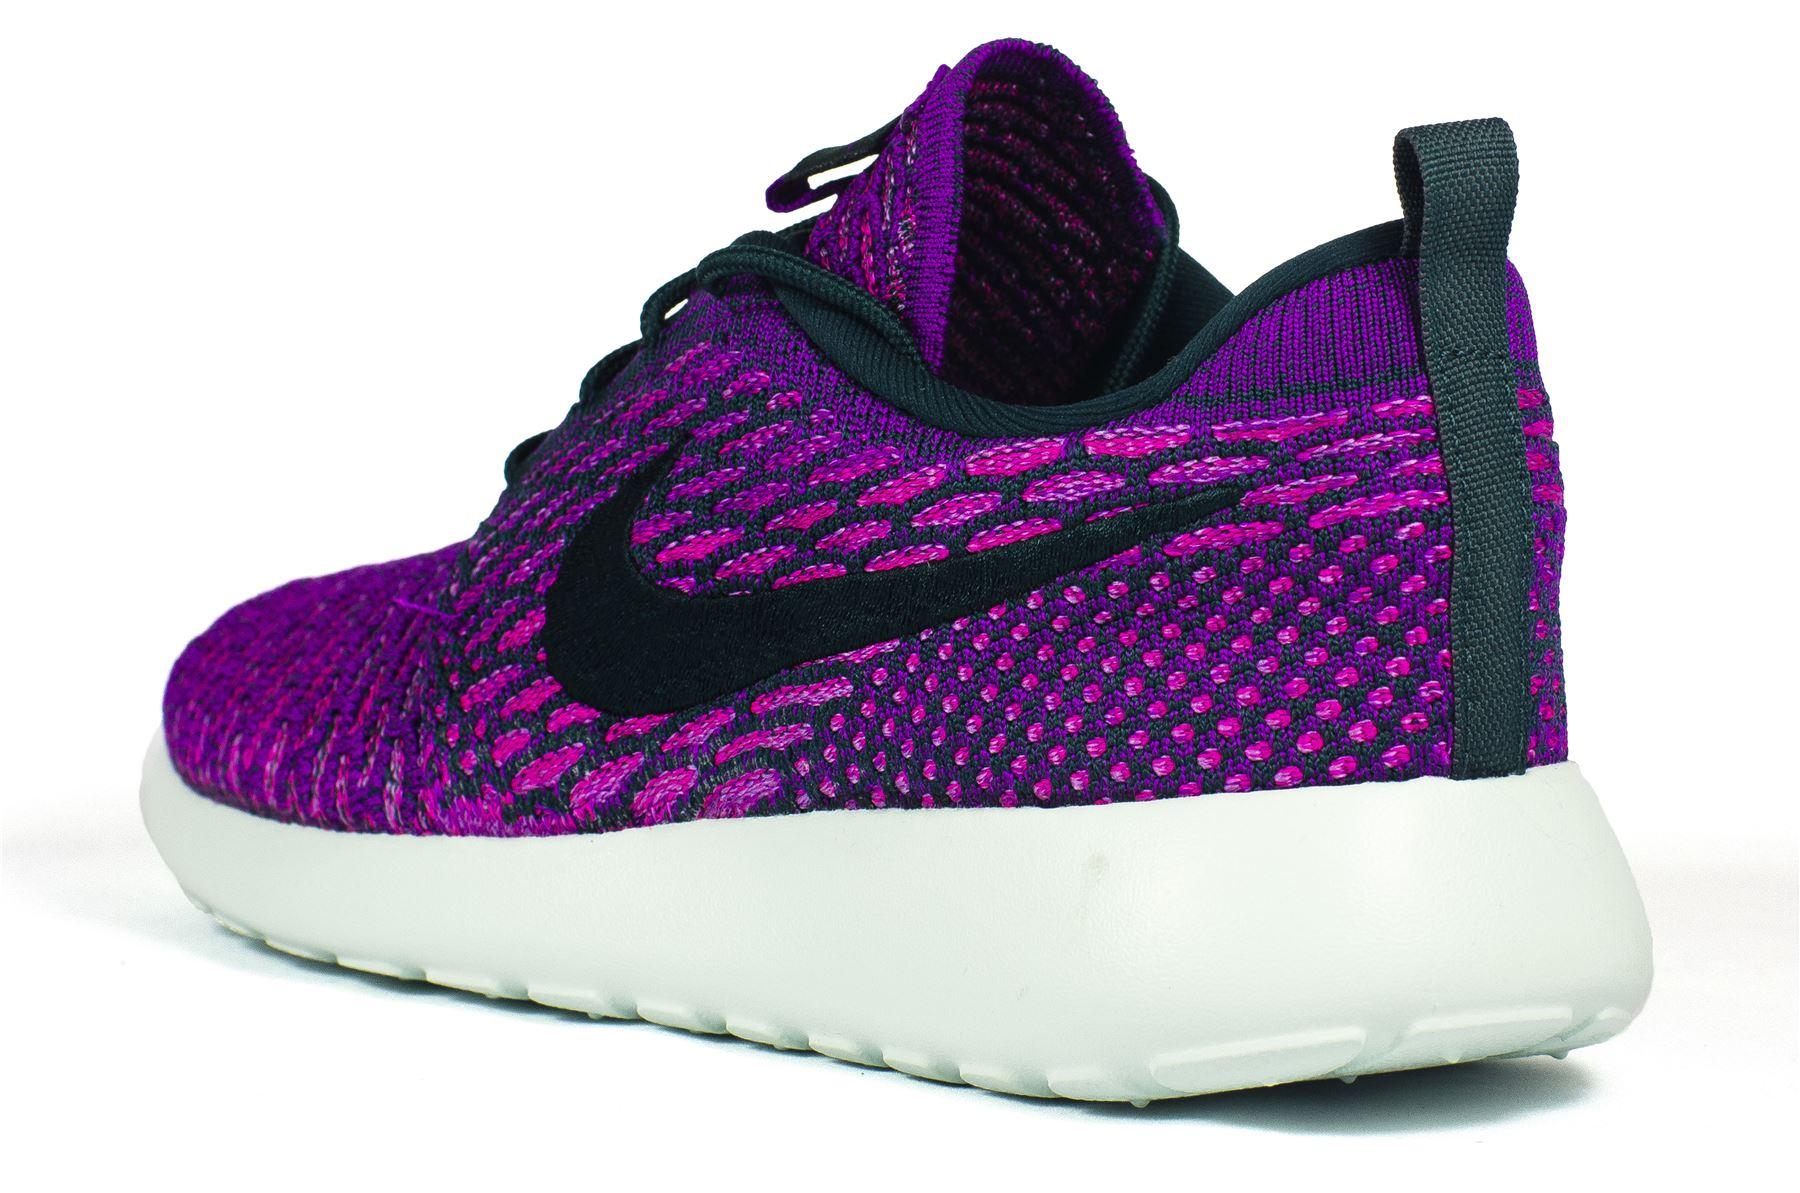 Nike Roshe Run in One Print & Mesh Damens Trainers in Run All Größes 800022